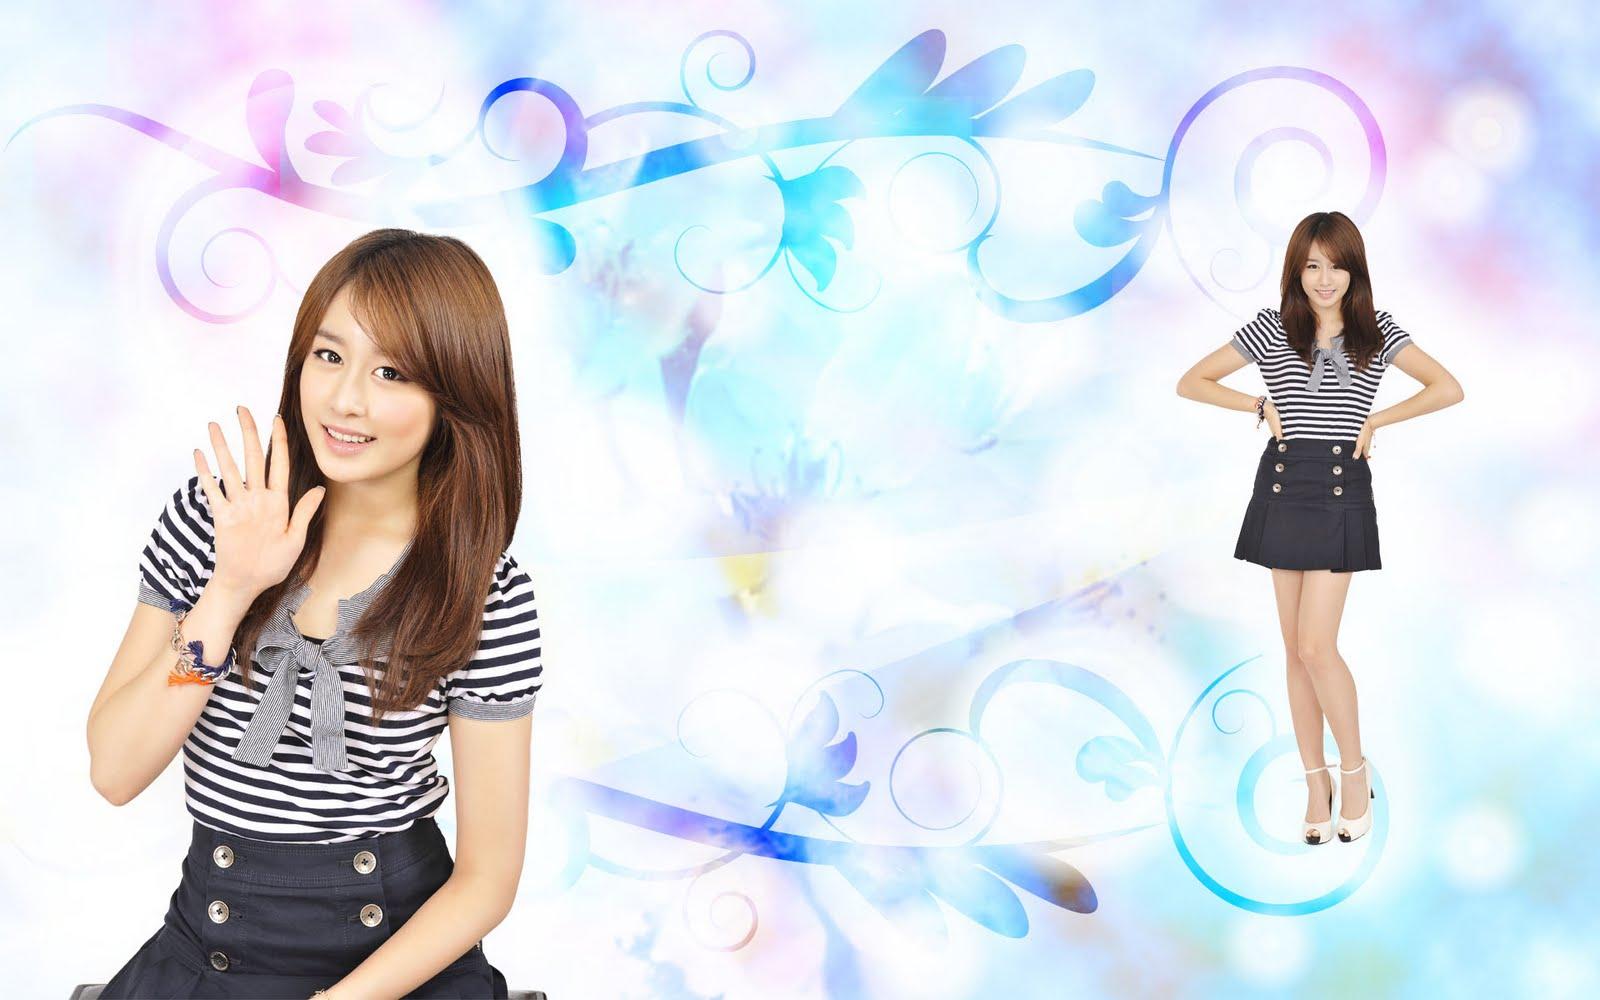 http://1.bp.blogspot.com/-CmkjBdvwDVE/TmAgb5NTNiI/AAAAAAAAElc/jPPMIVcjueE/s1600/t-ara+jiyeon+wallpaper+%25282%2529.jpg